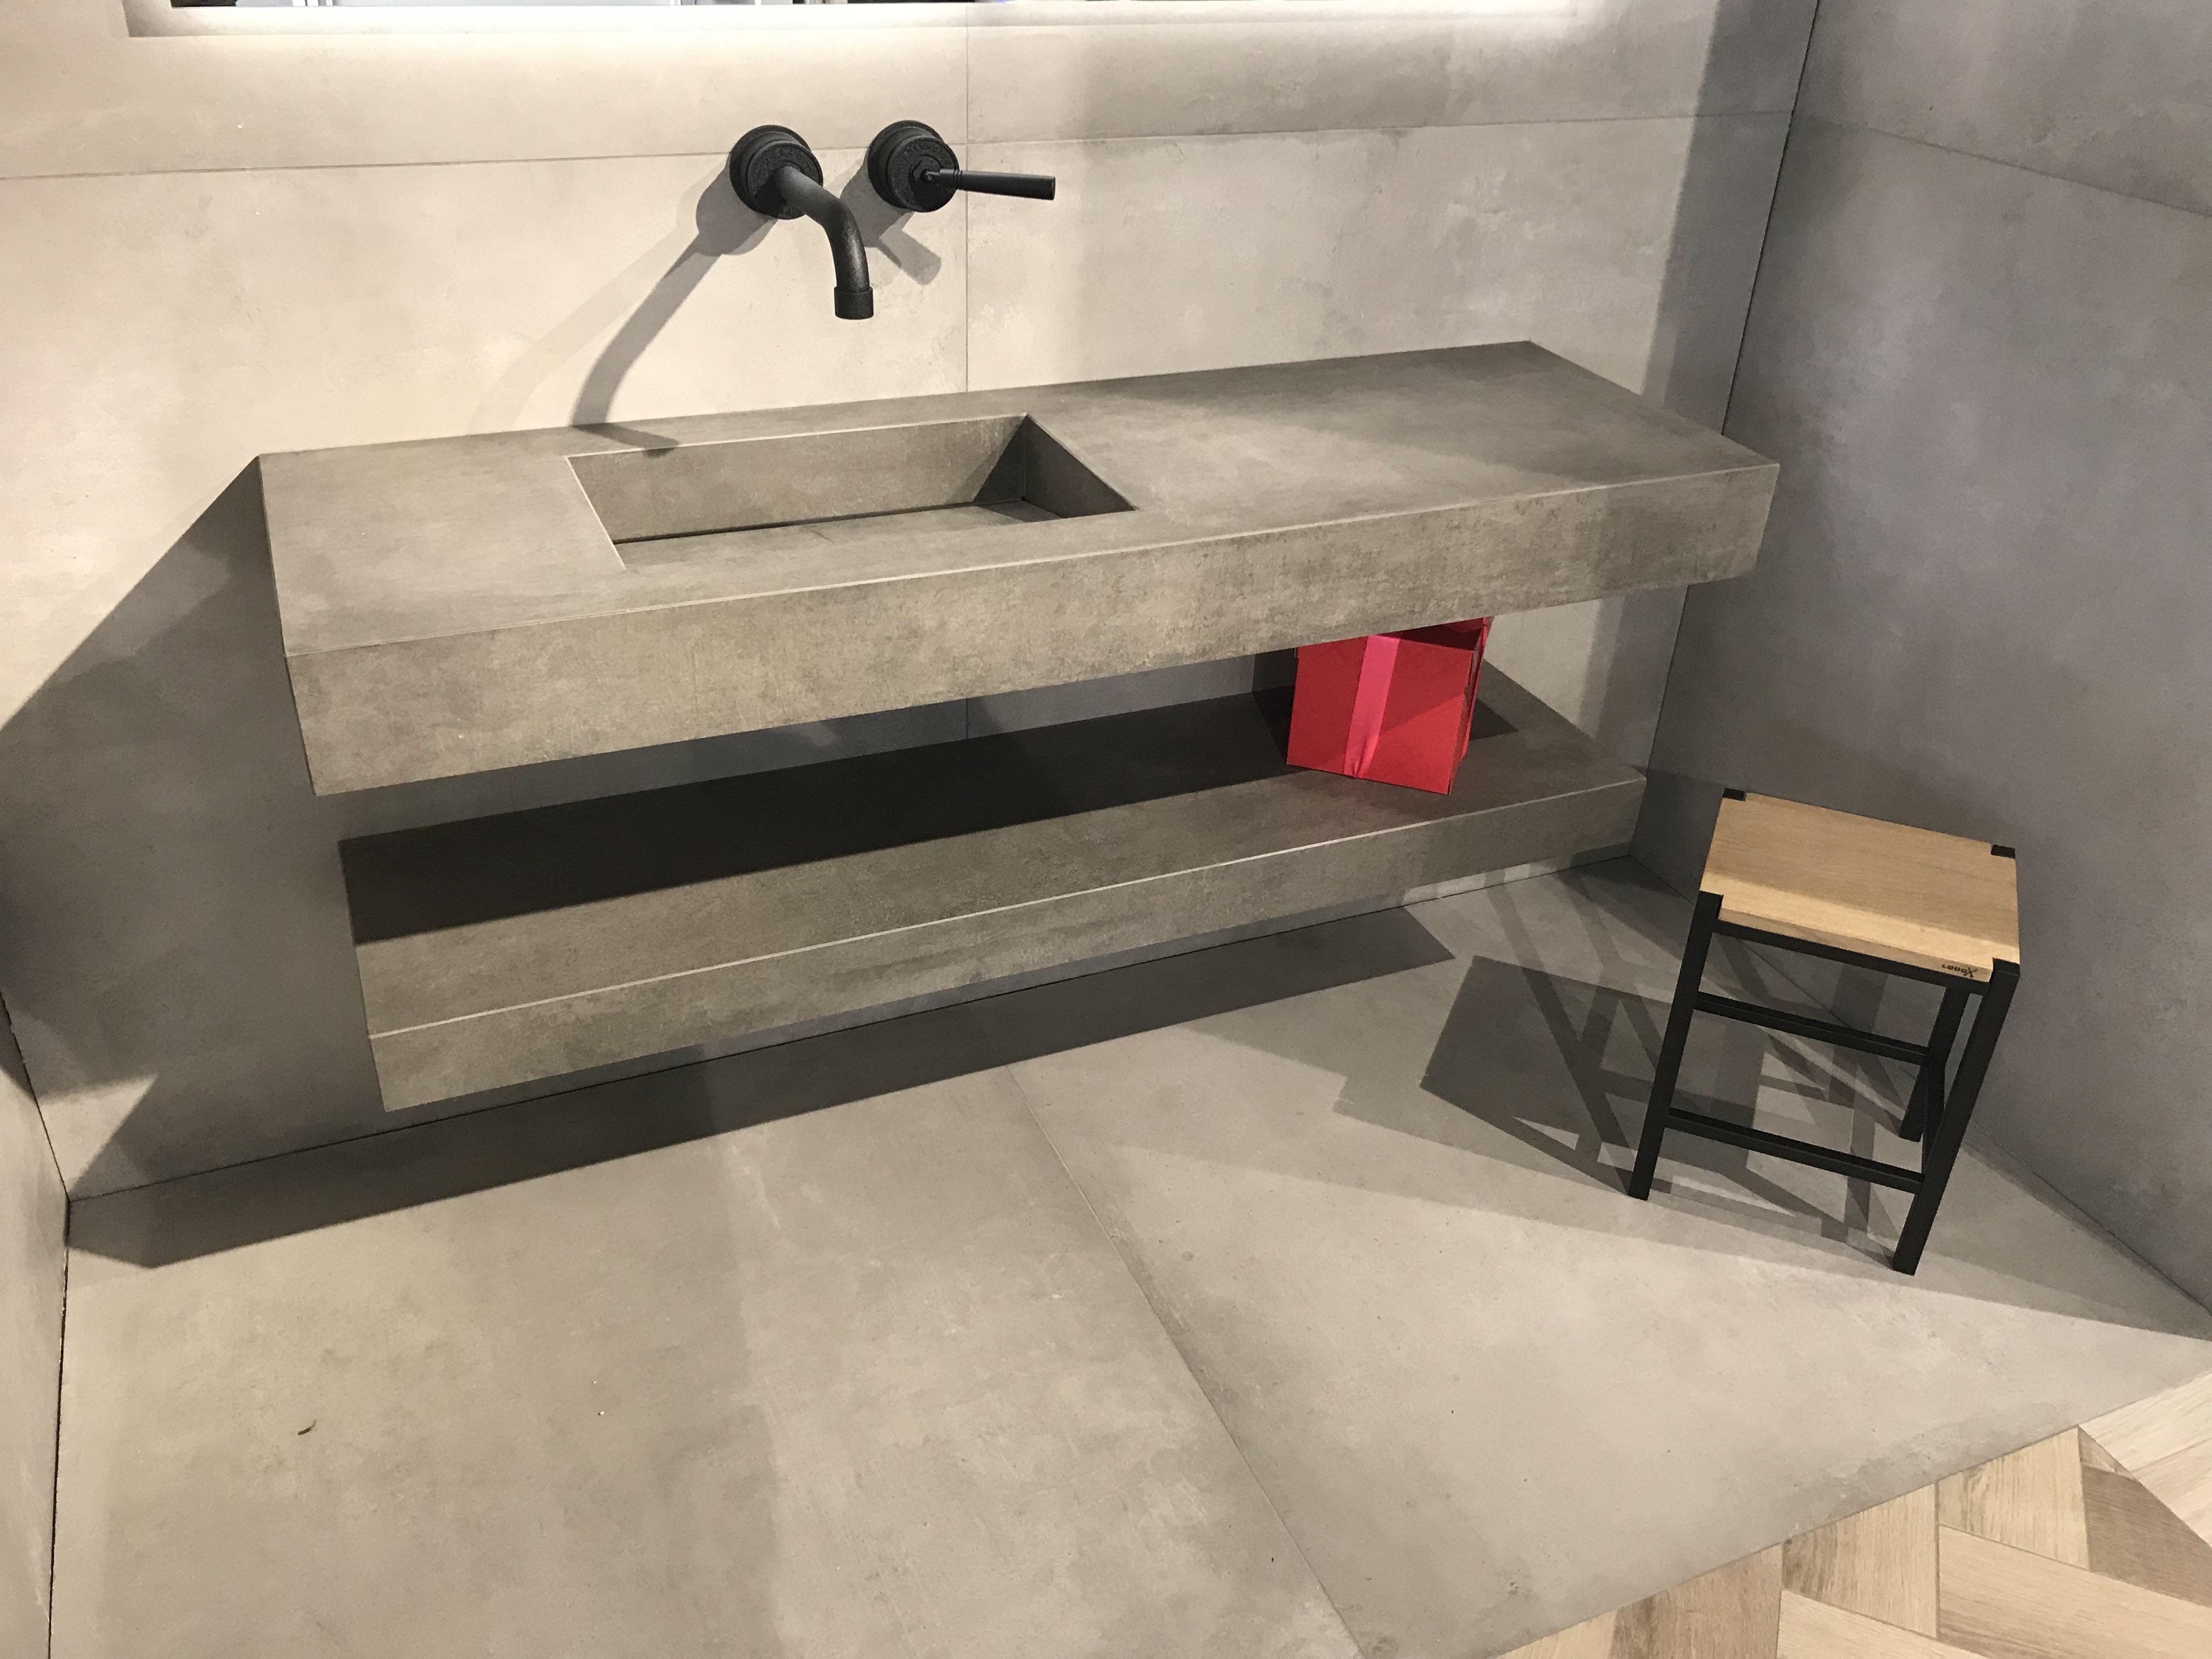 Jee O Wastafel : Kronos betonlook wastafel sandalo prima materia met kraan jee o soho